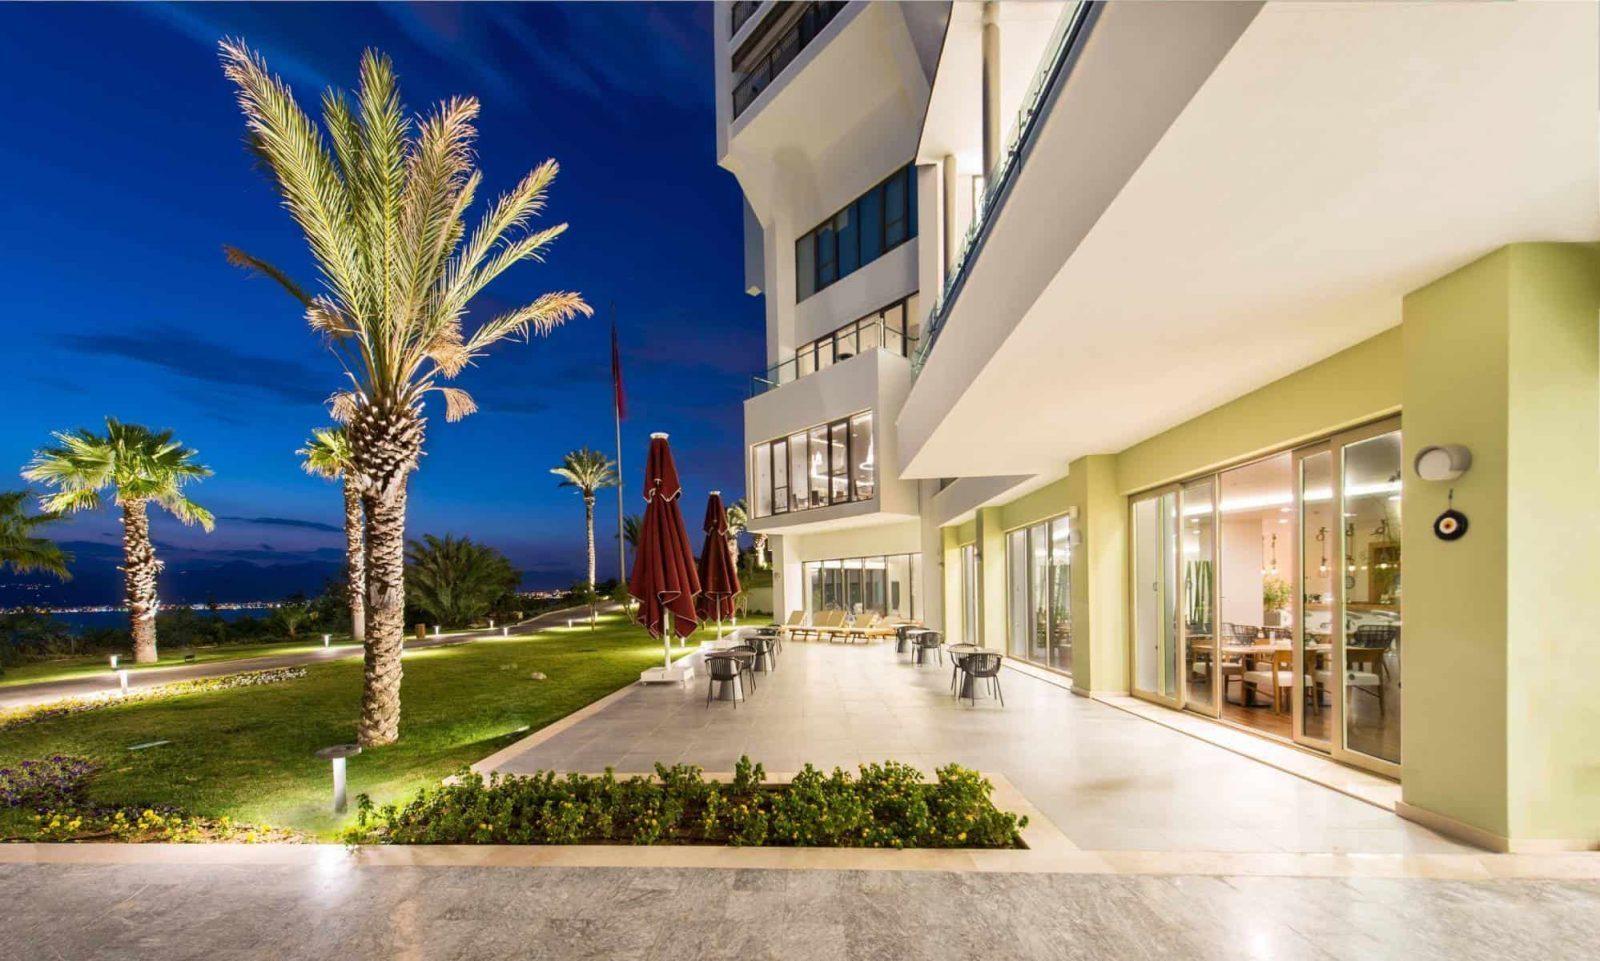 The LifeCo Antalya outside